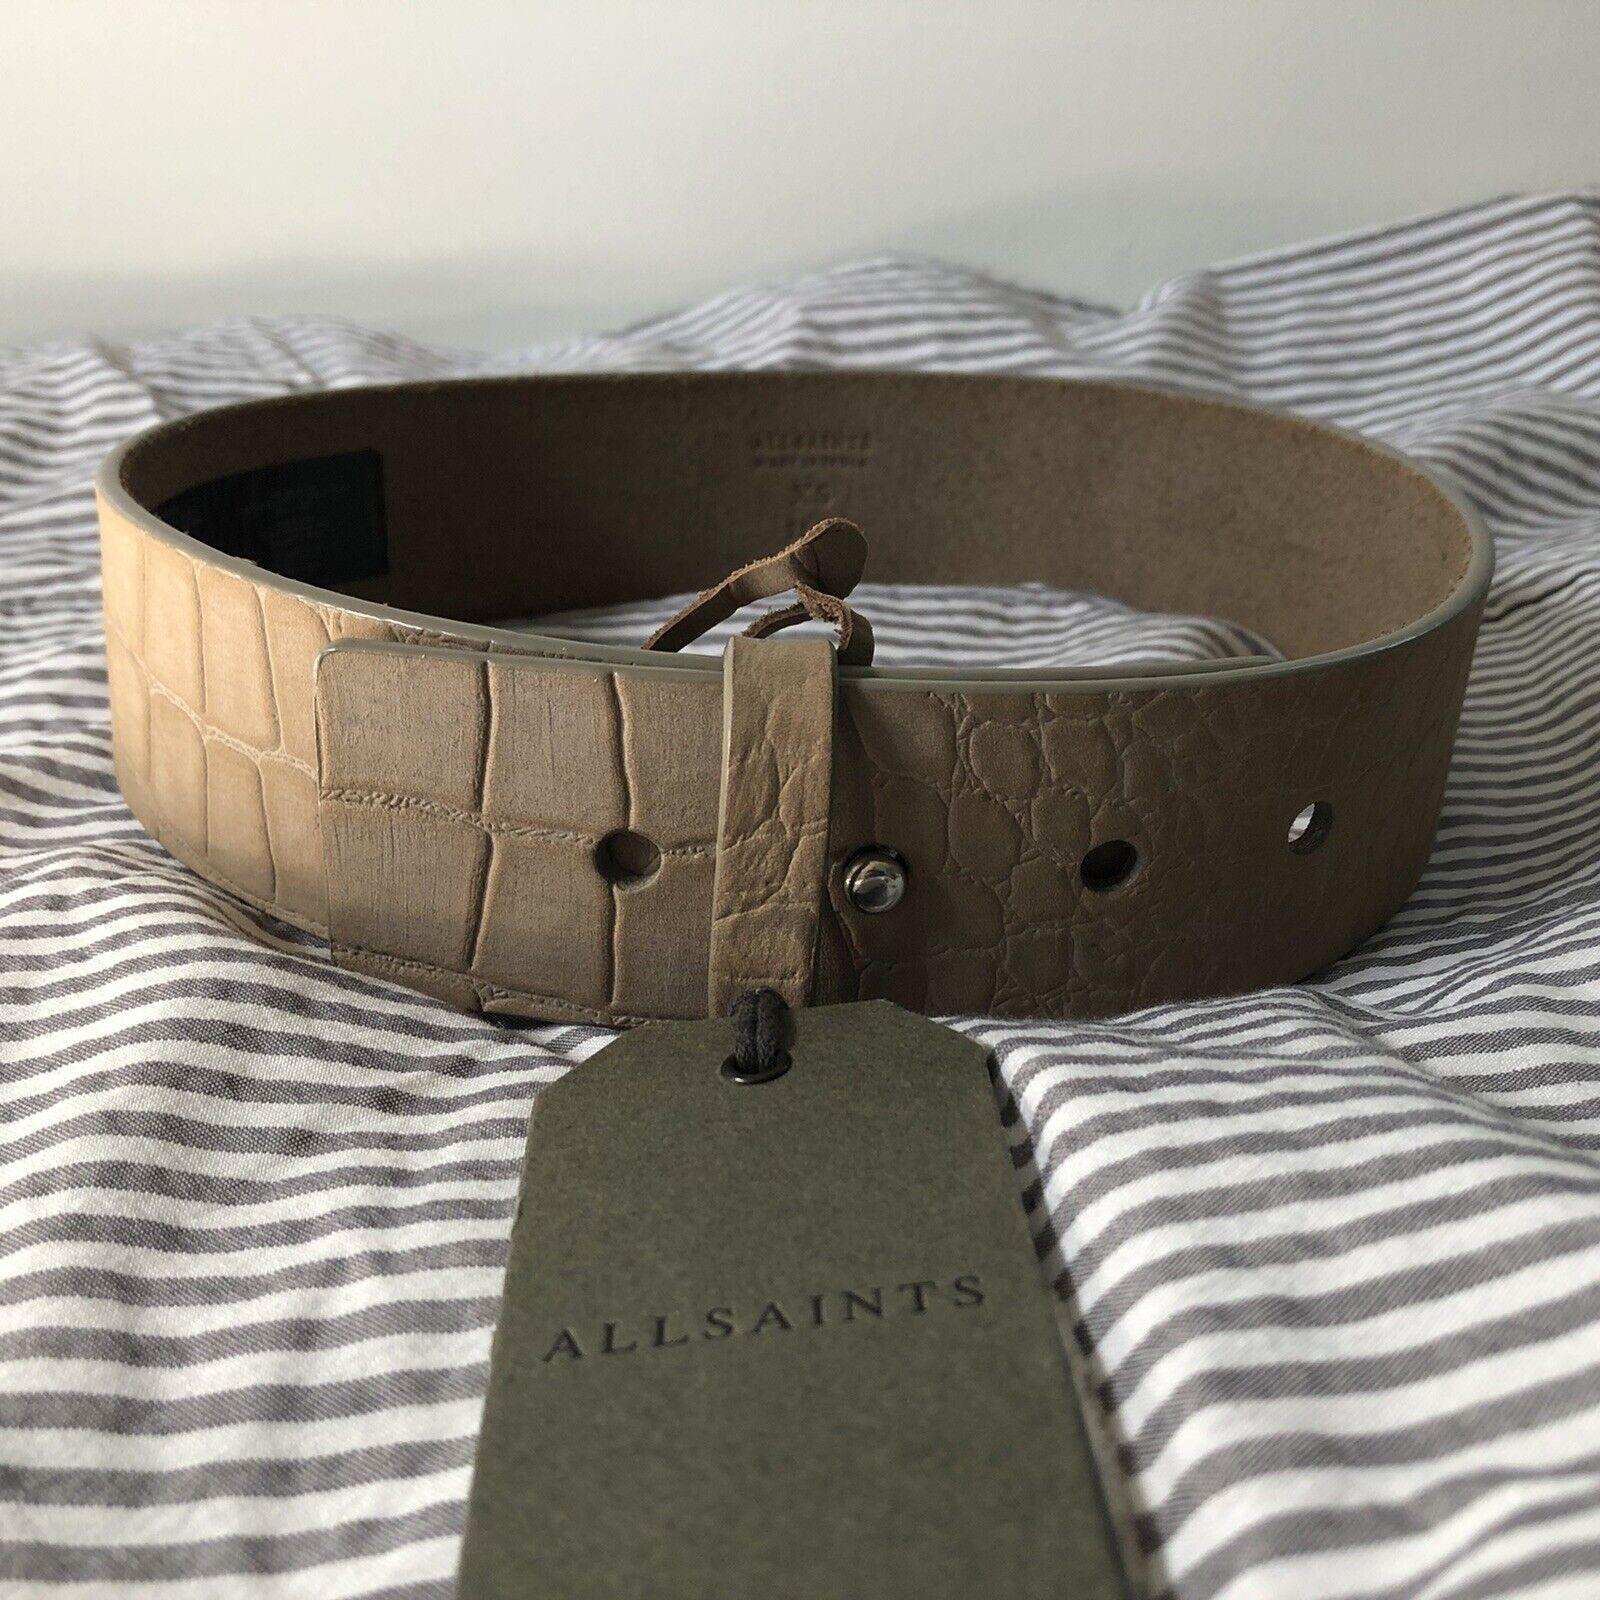 **NEW!! Size XS ALLSAINTS Mimosa Croco Nubuck Leather Waist Belt Light Grey